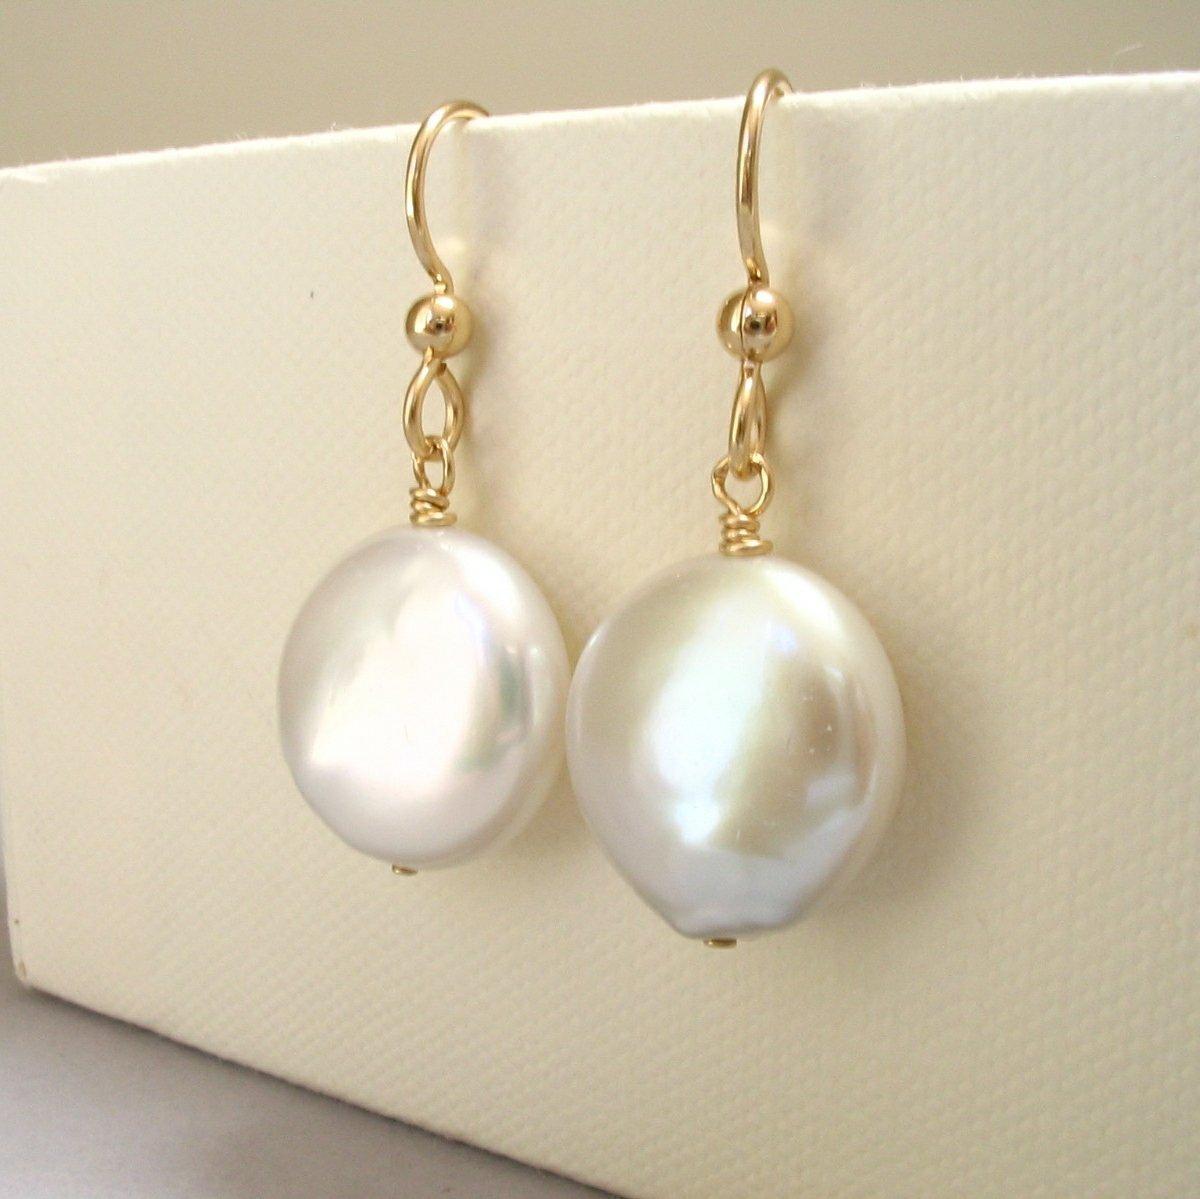 Freshwater Coin Pearl Earrings Gold Cross Earrings Gold Coin Pearl Earrings Gold Pearl Earrings Everyday Pearl Earrings